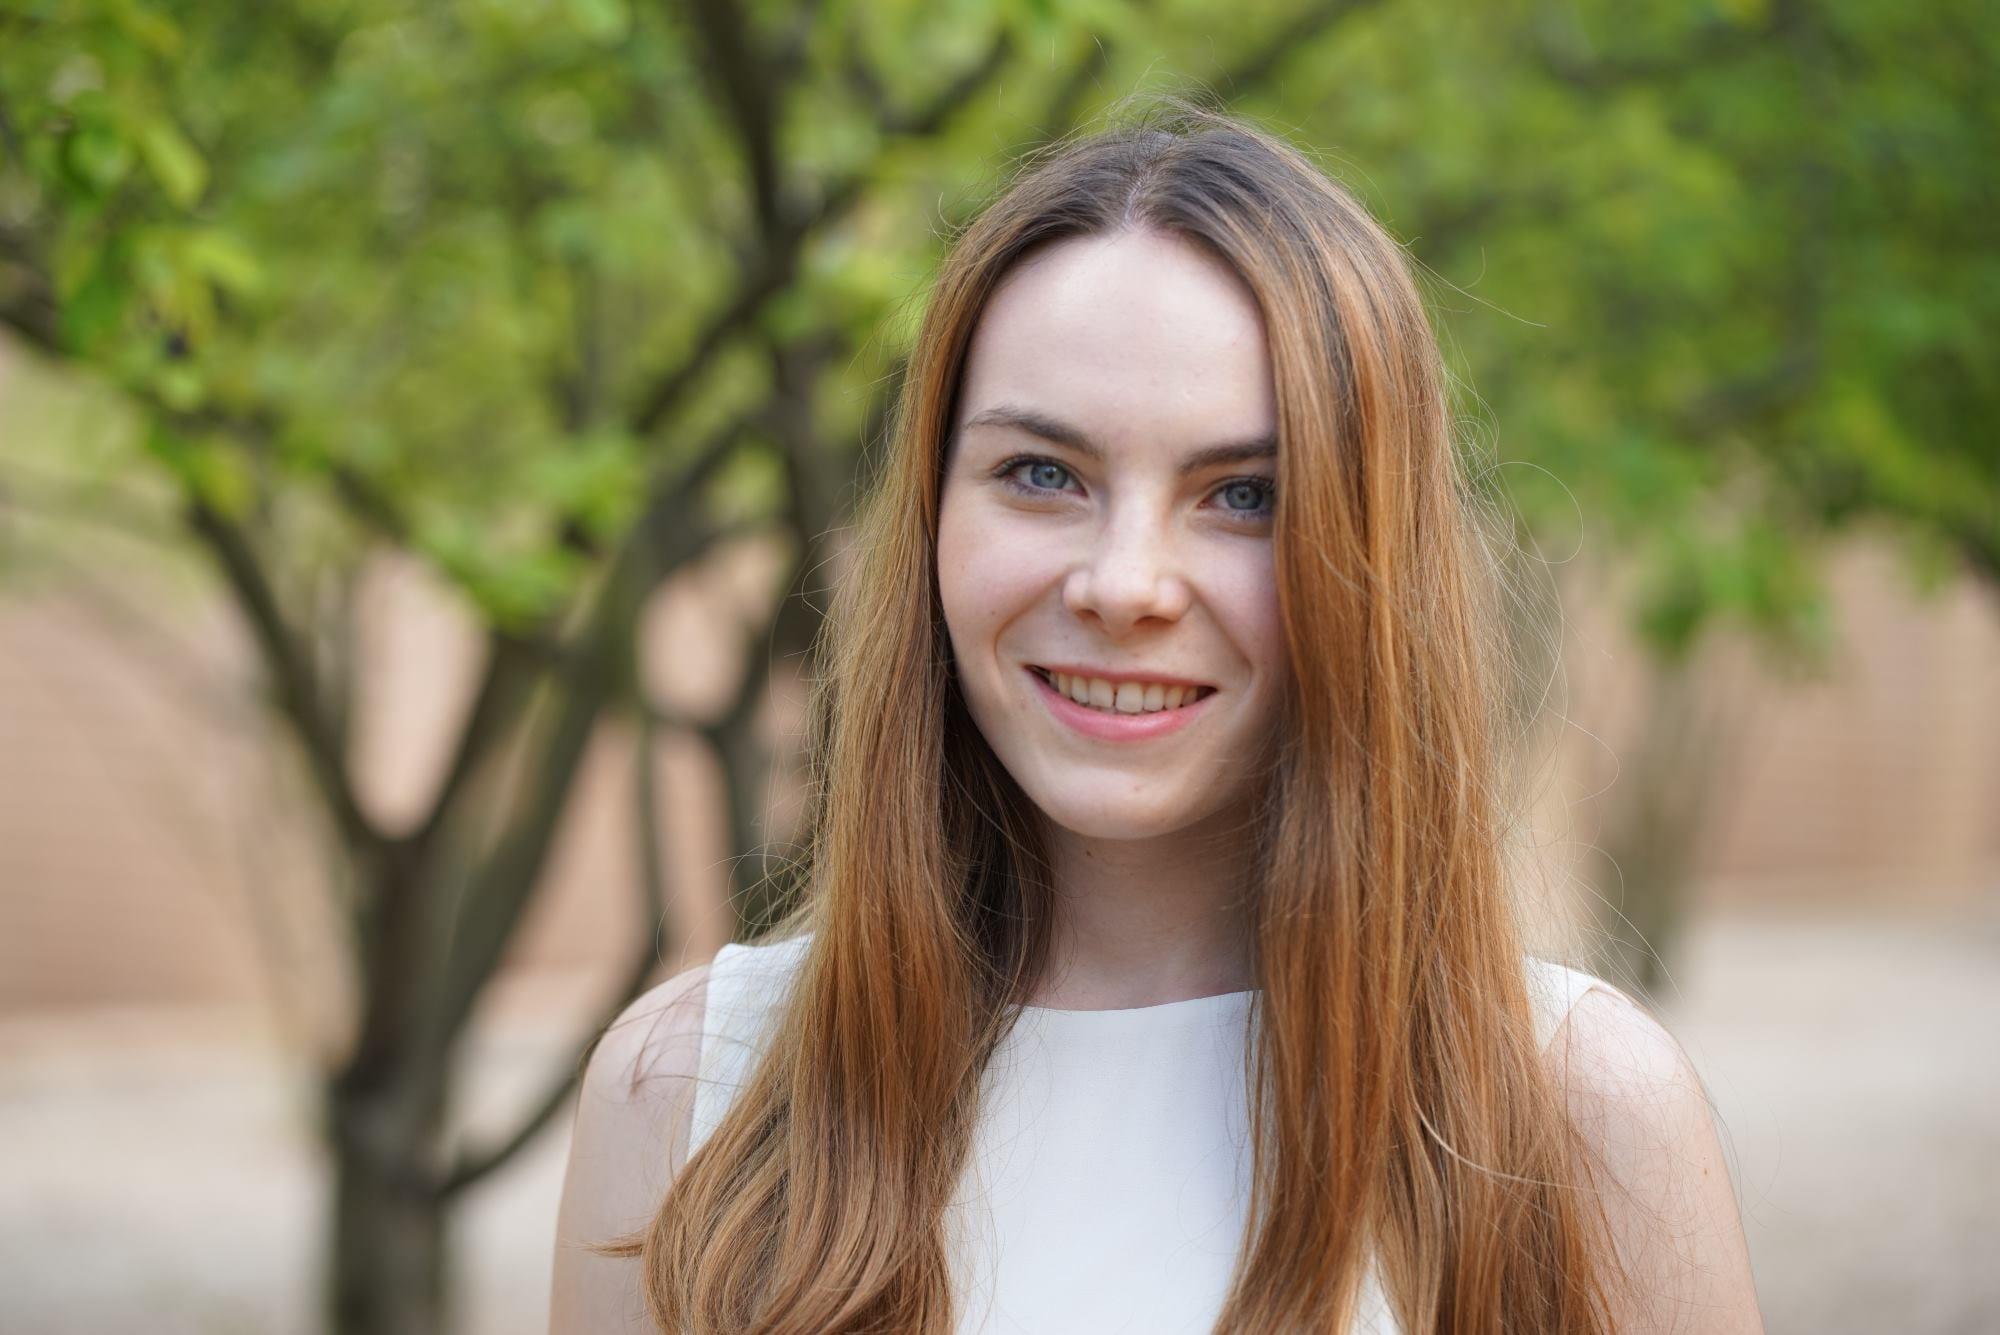 Alessia Blöchlinger